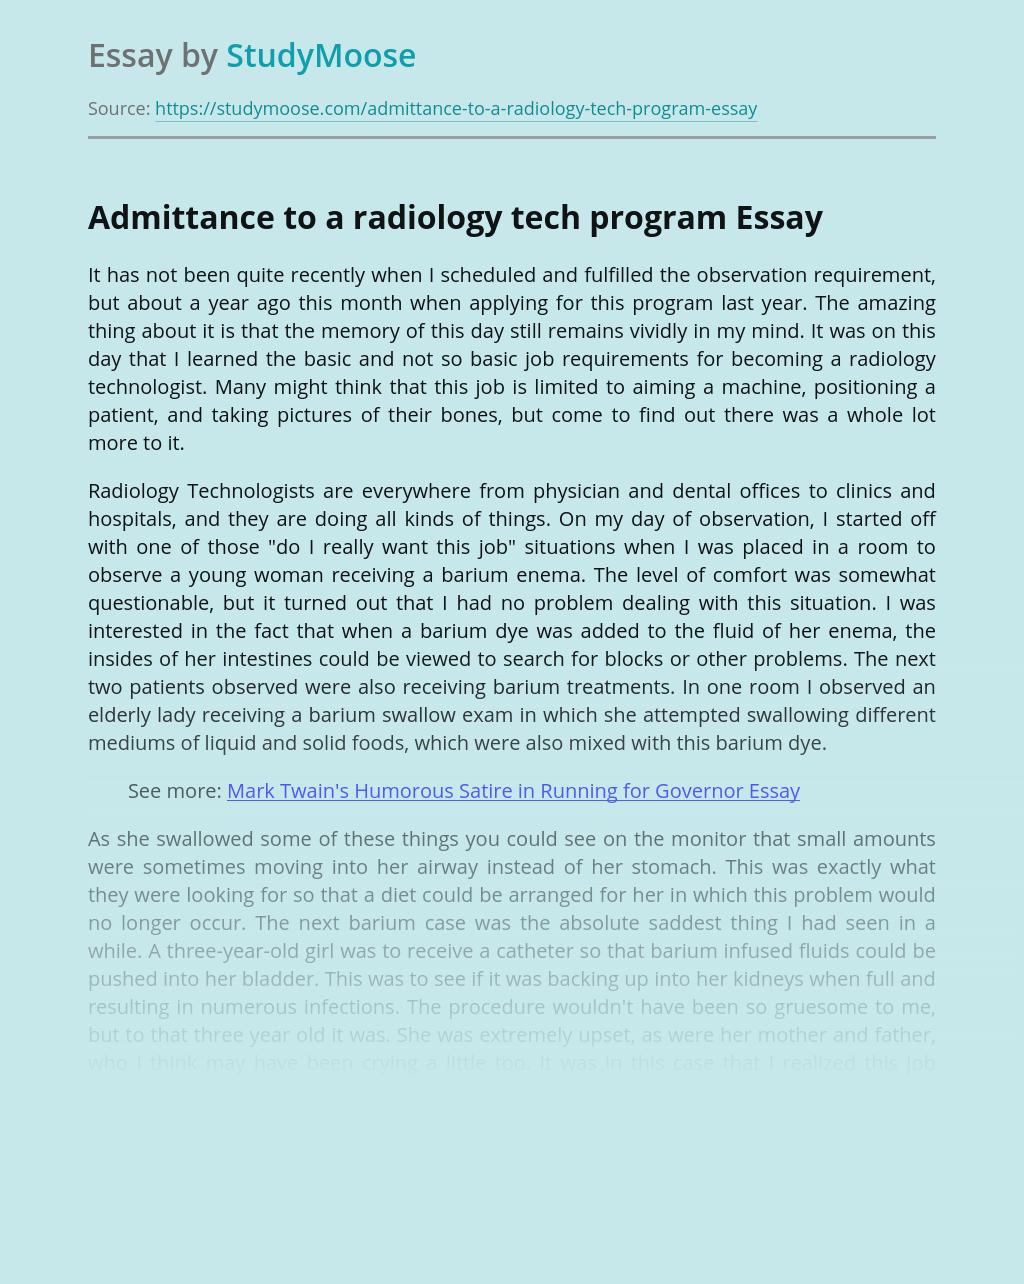 Admittance to a radiology tech program